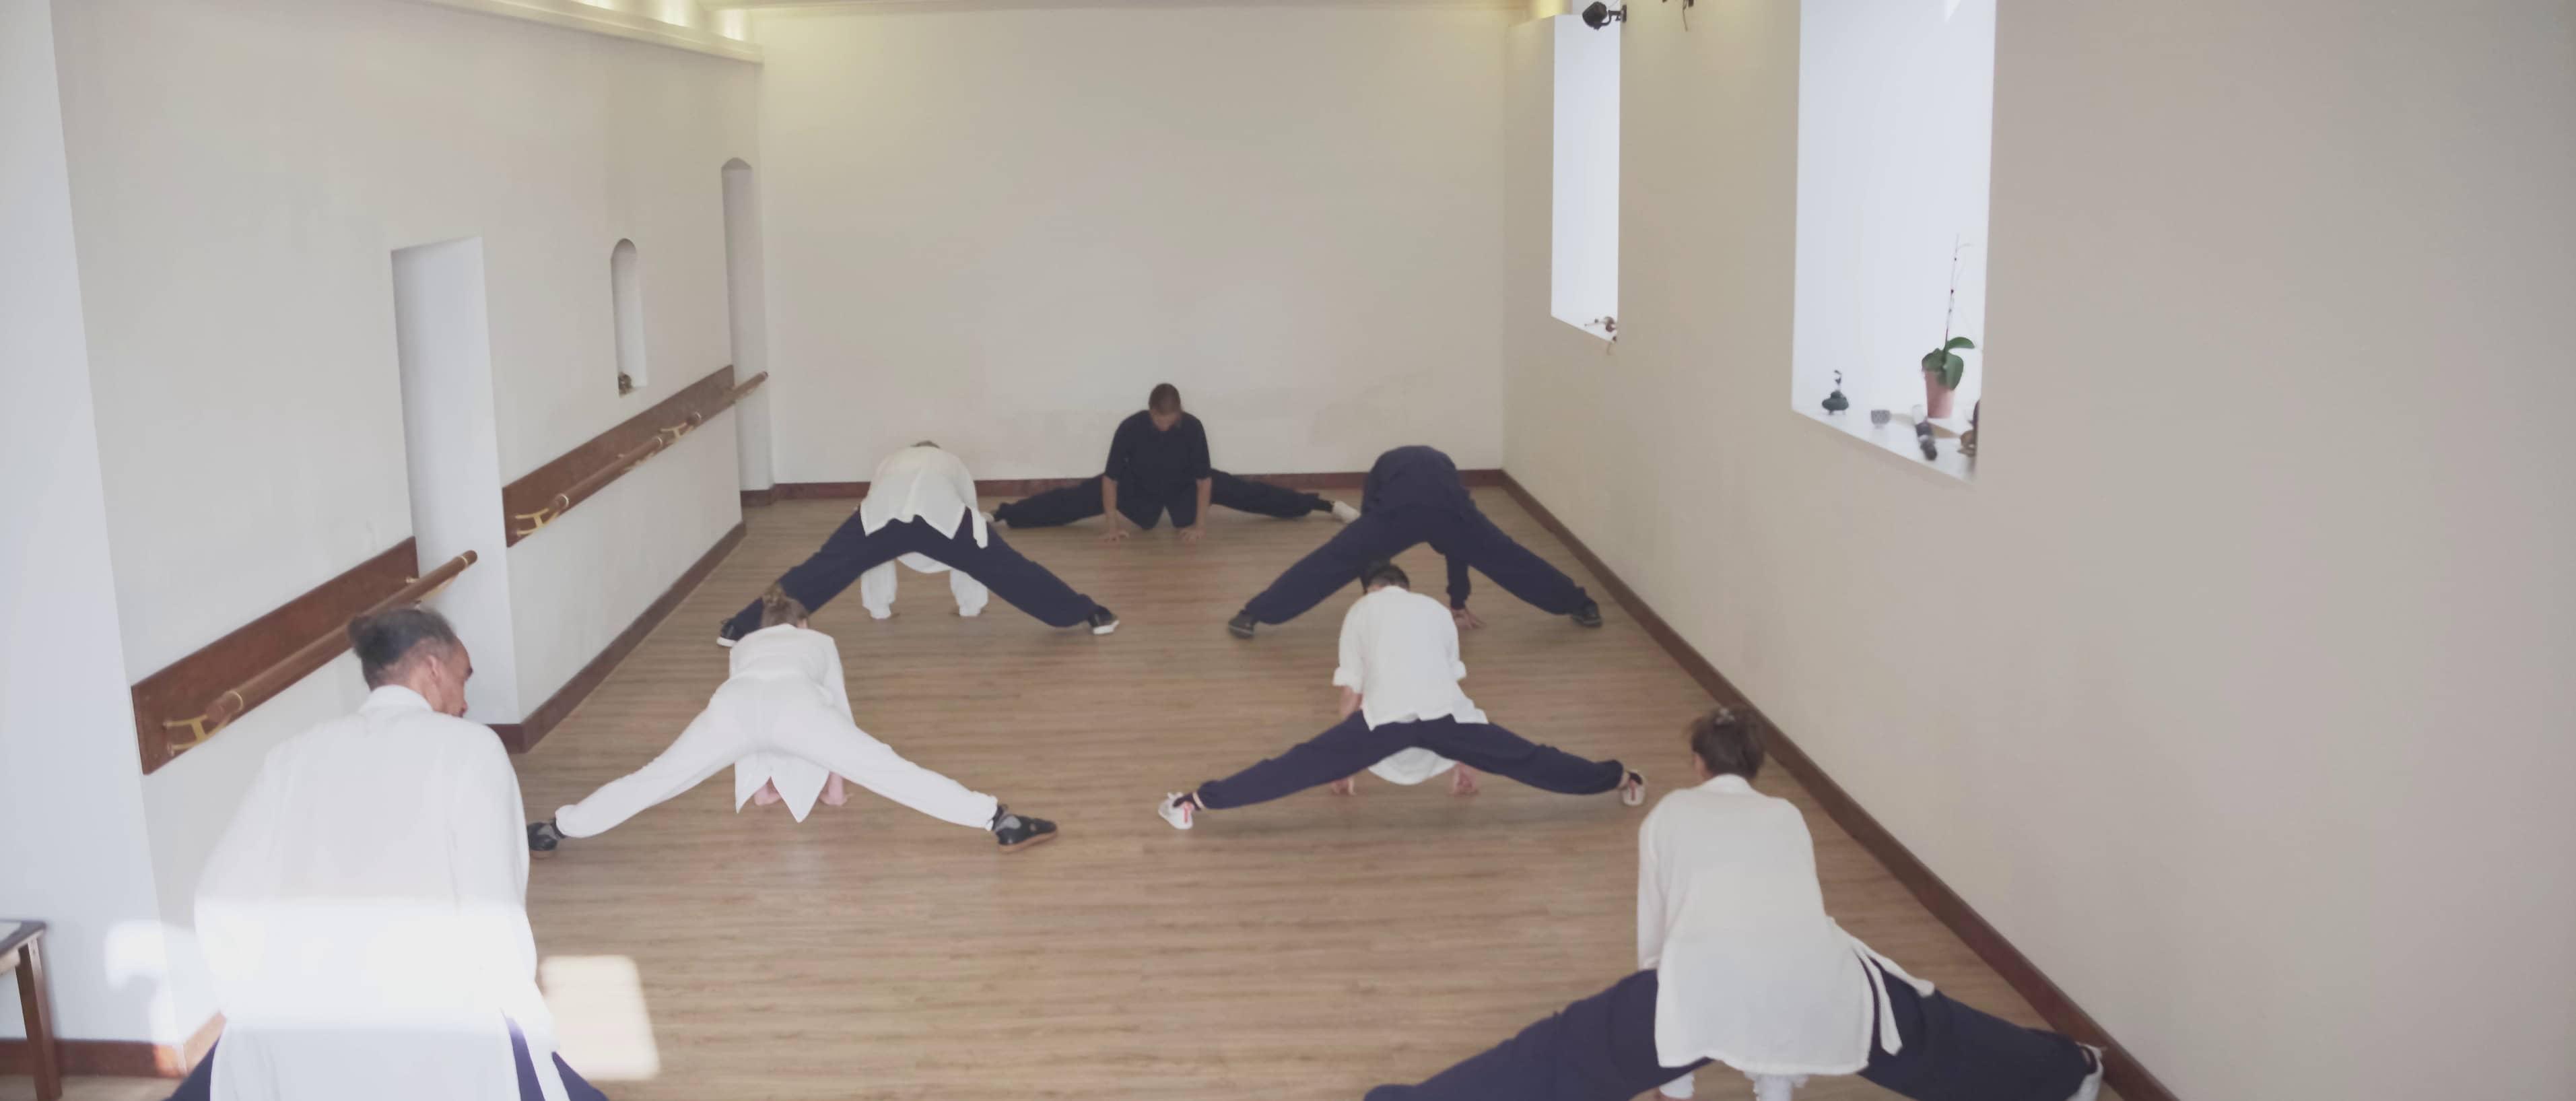 Basic Flexibility for the Jibenquan Form